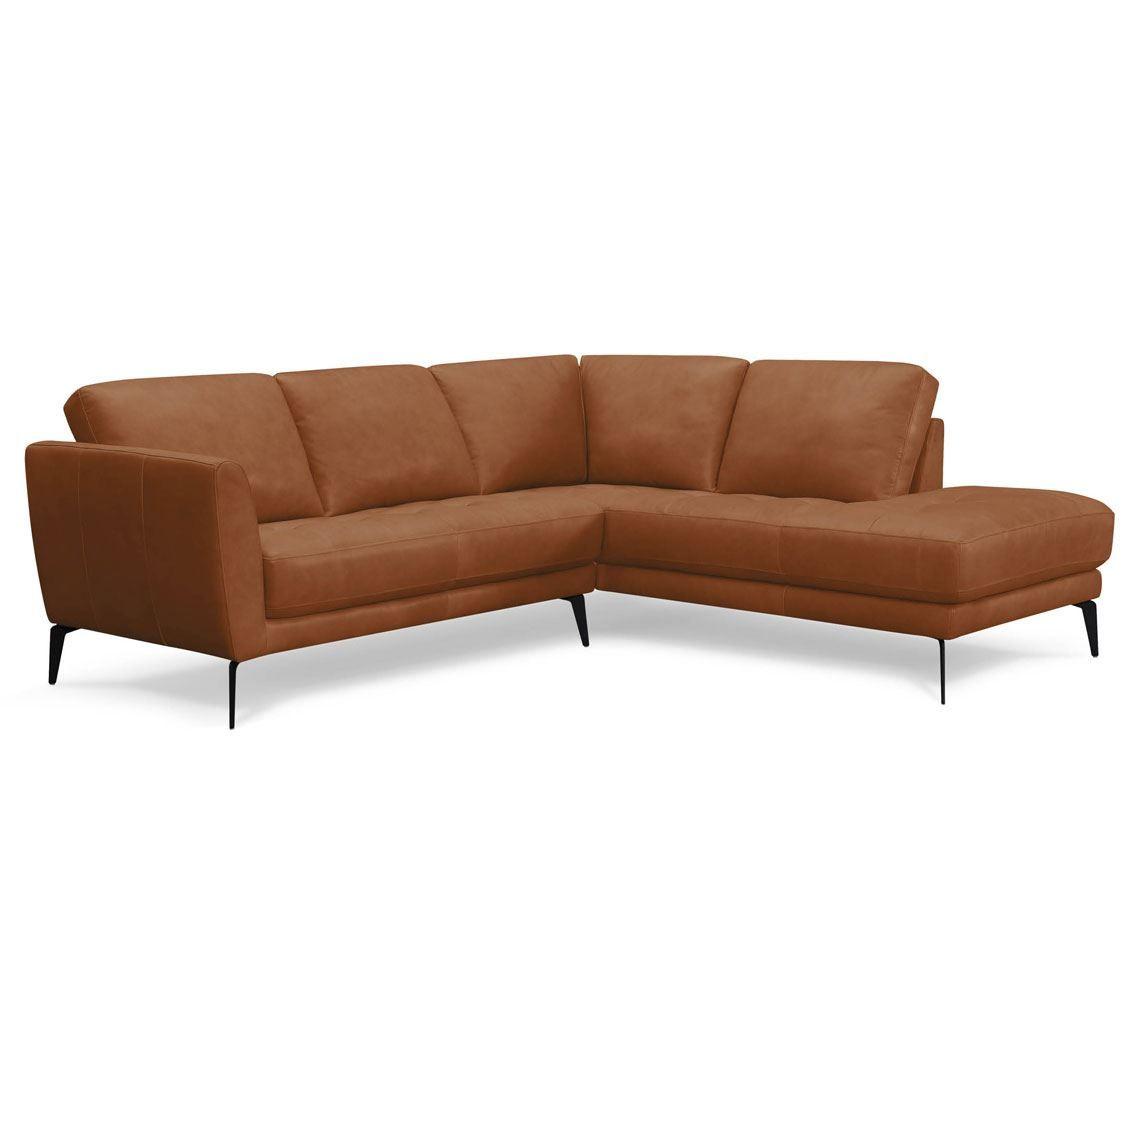 ATTICA 2 Seat Leather Modular Sofa with Right Terminal ...